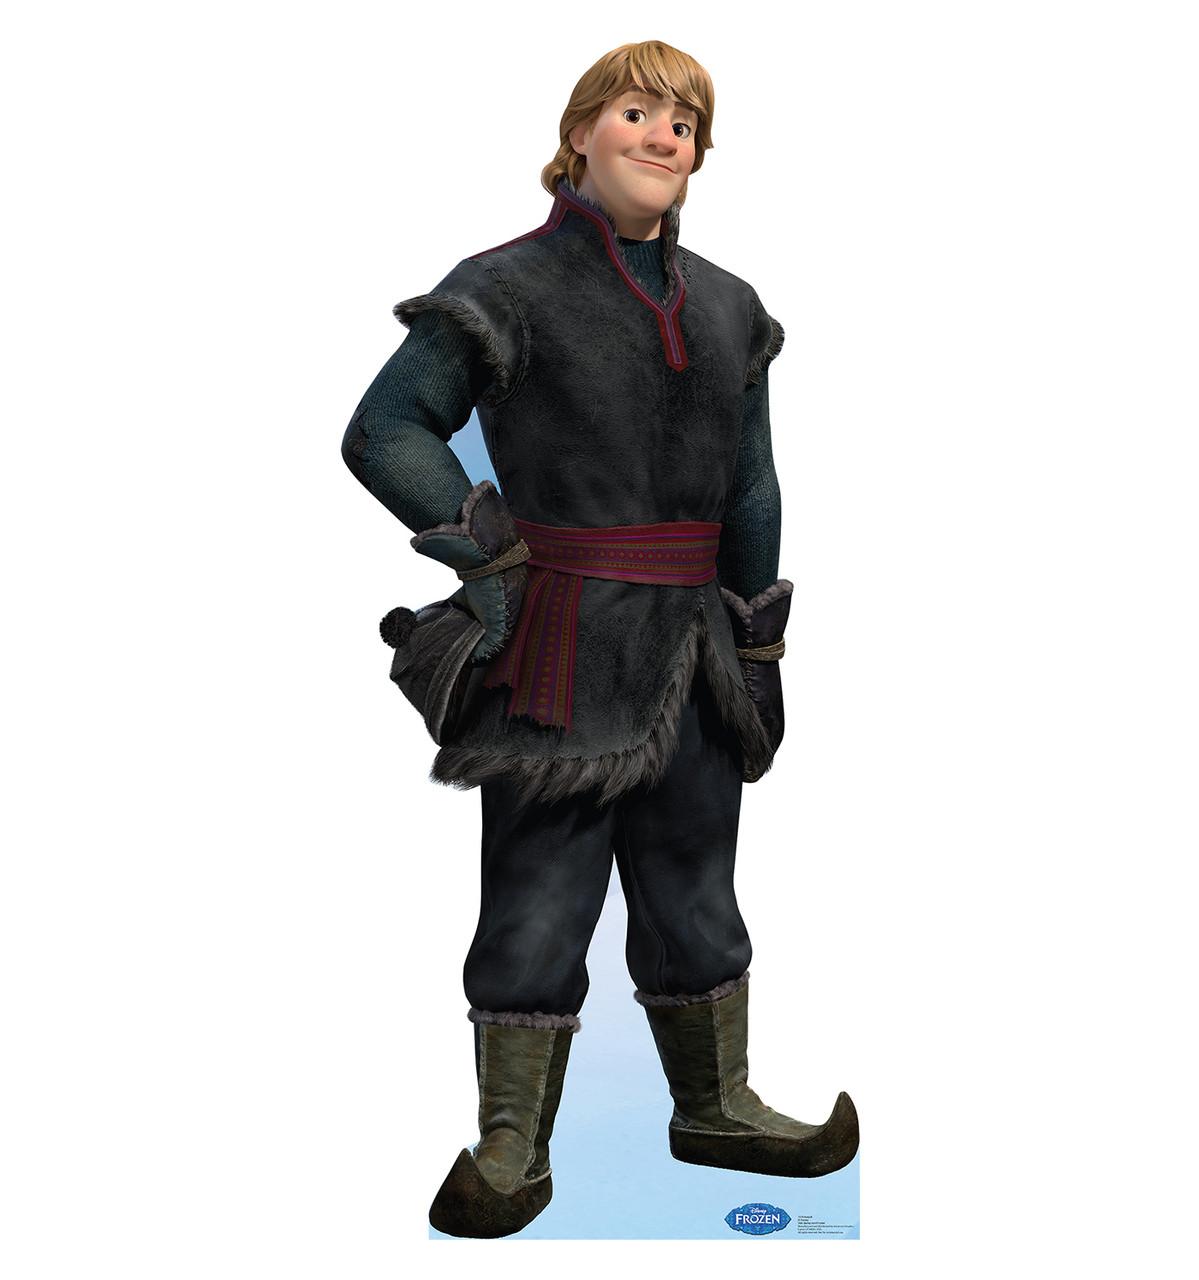 Life-size Kristoff - Disney's Frozen Cardboard Standup